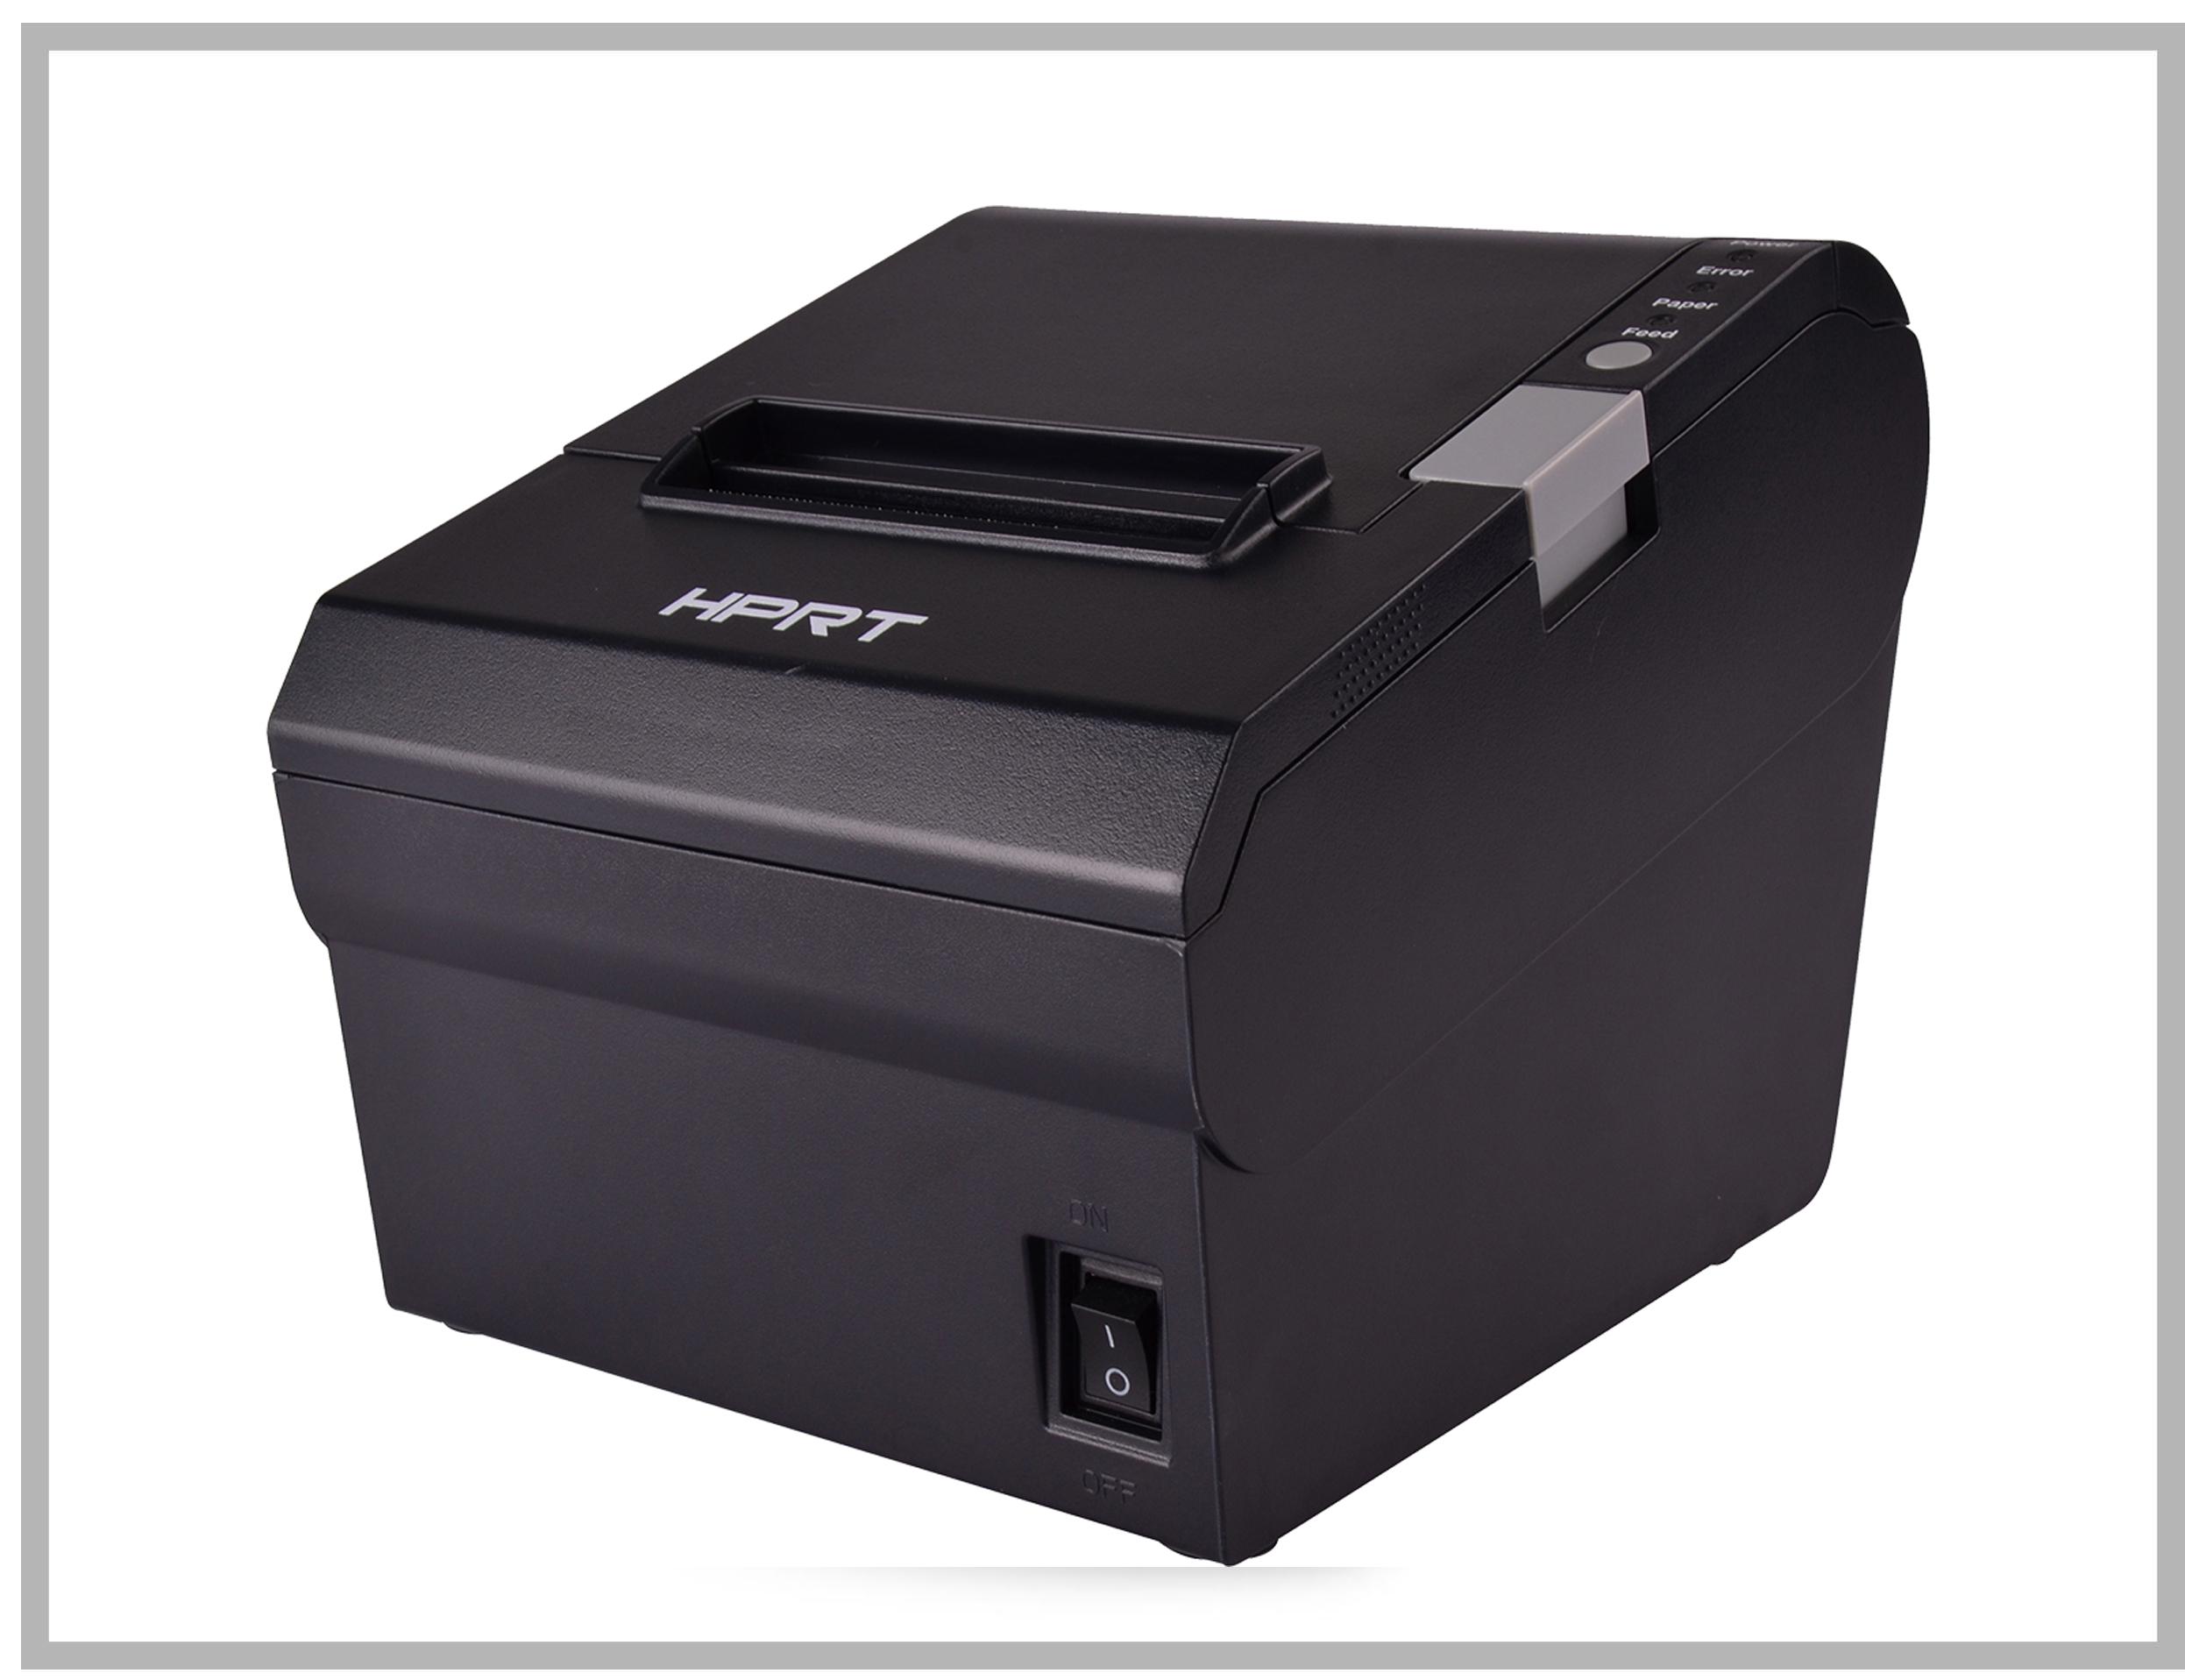 HPRT TP-805